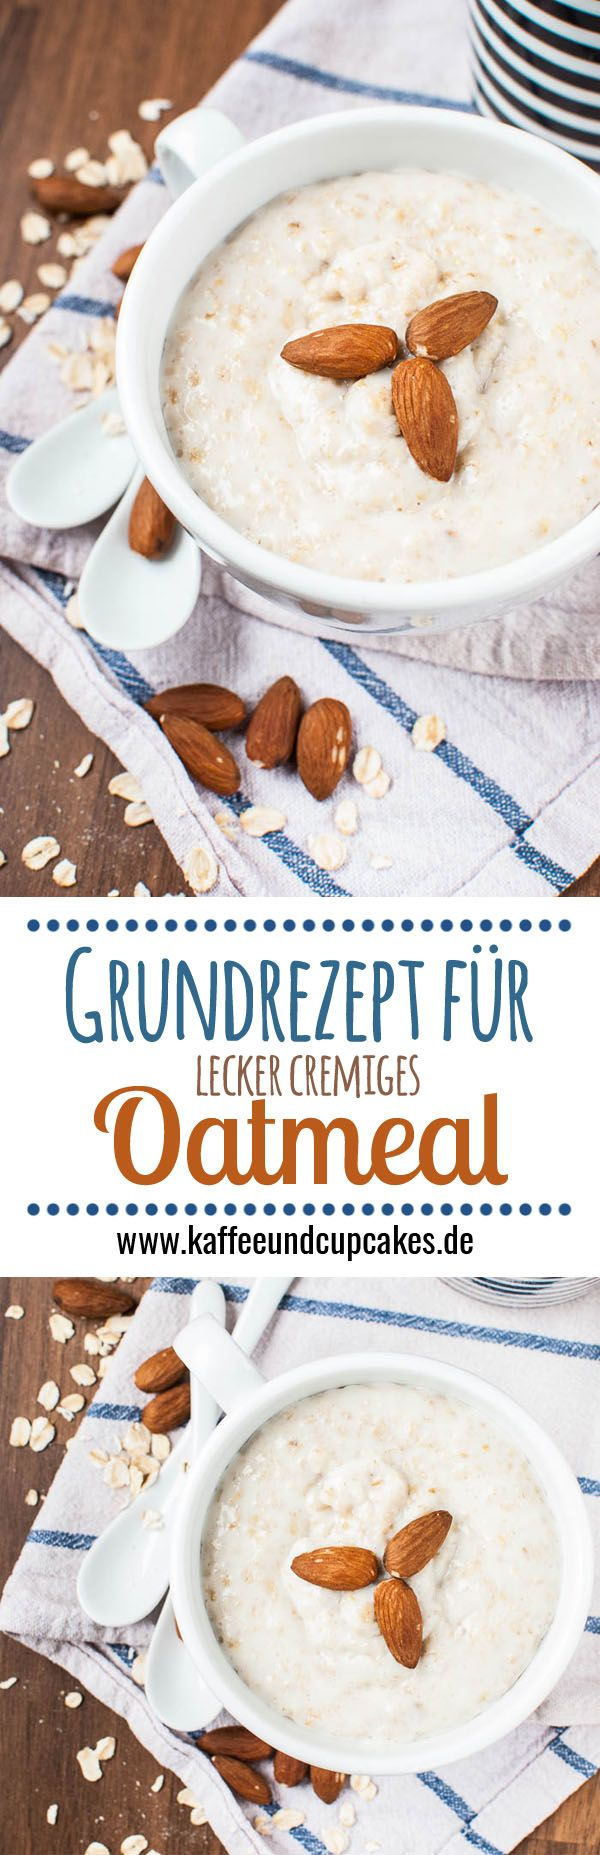 Photo of Oatmeal: basic recipe